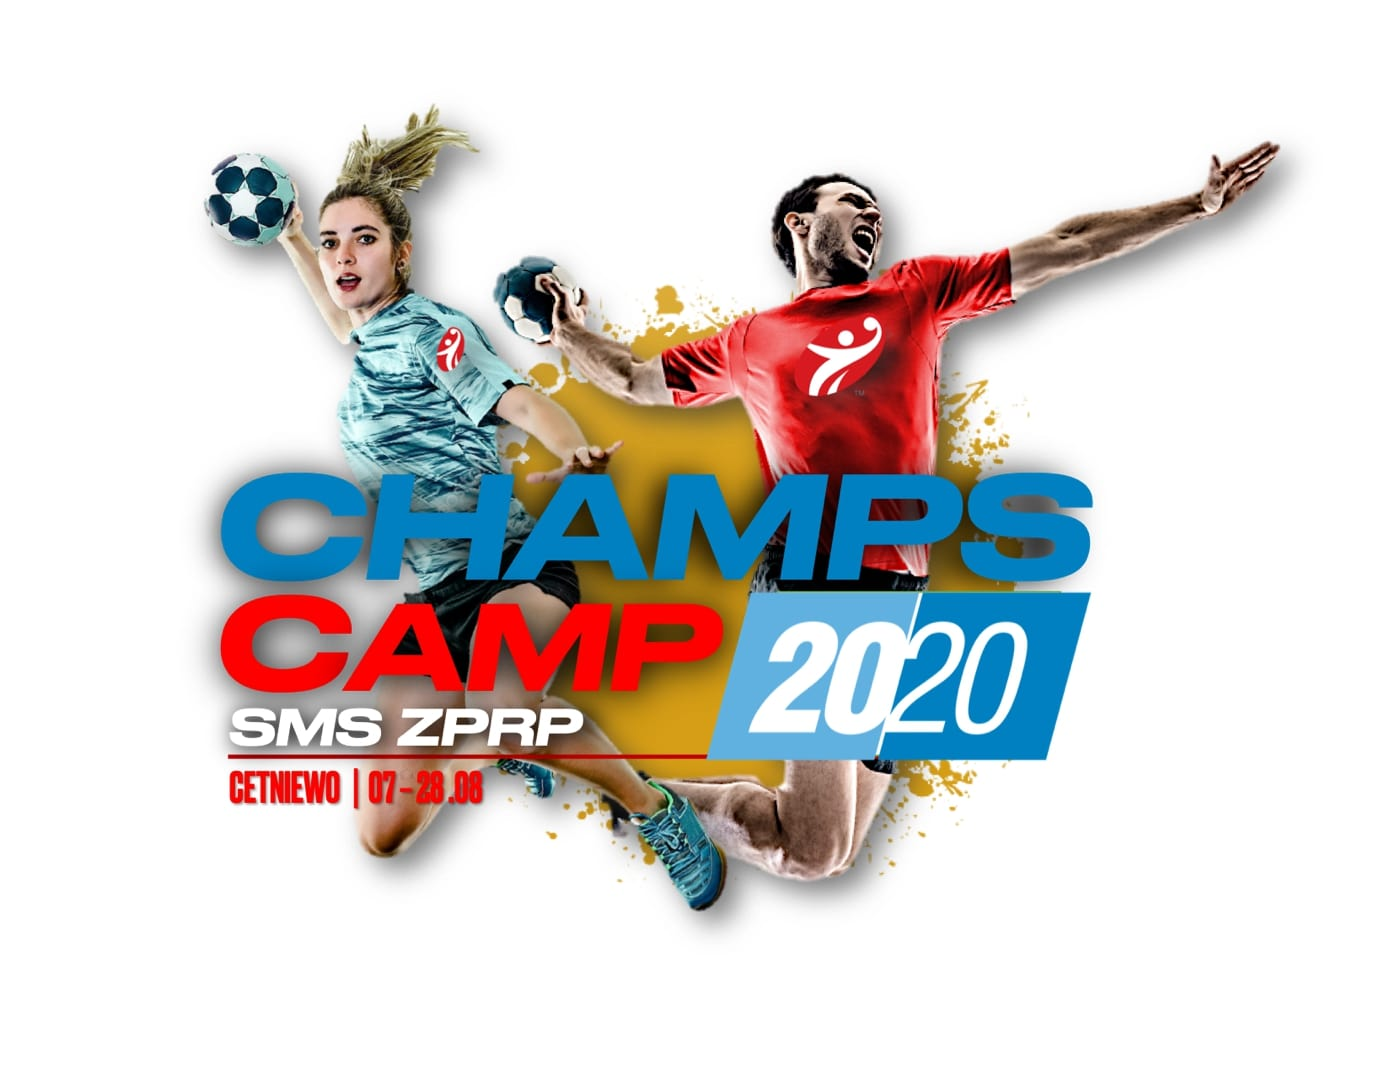 Champ's Camp SMS ZPRP w COS OPO Cetniewo